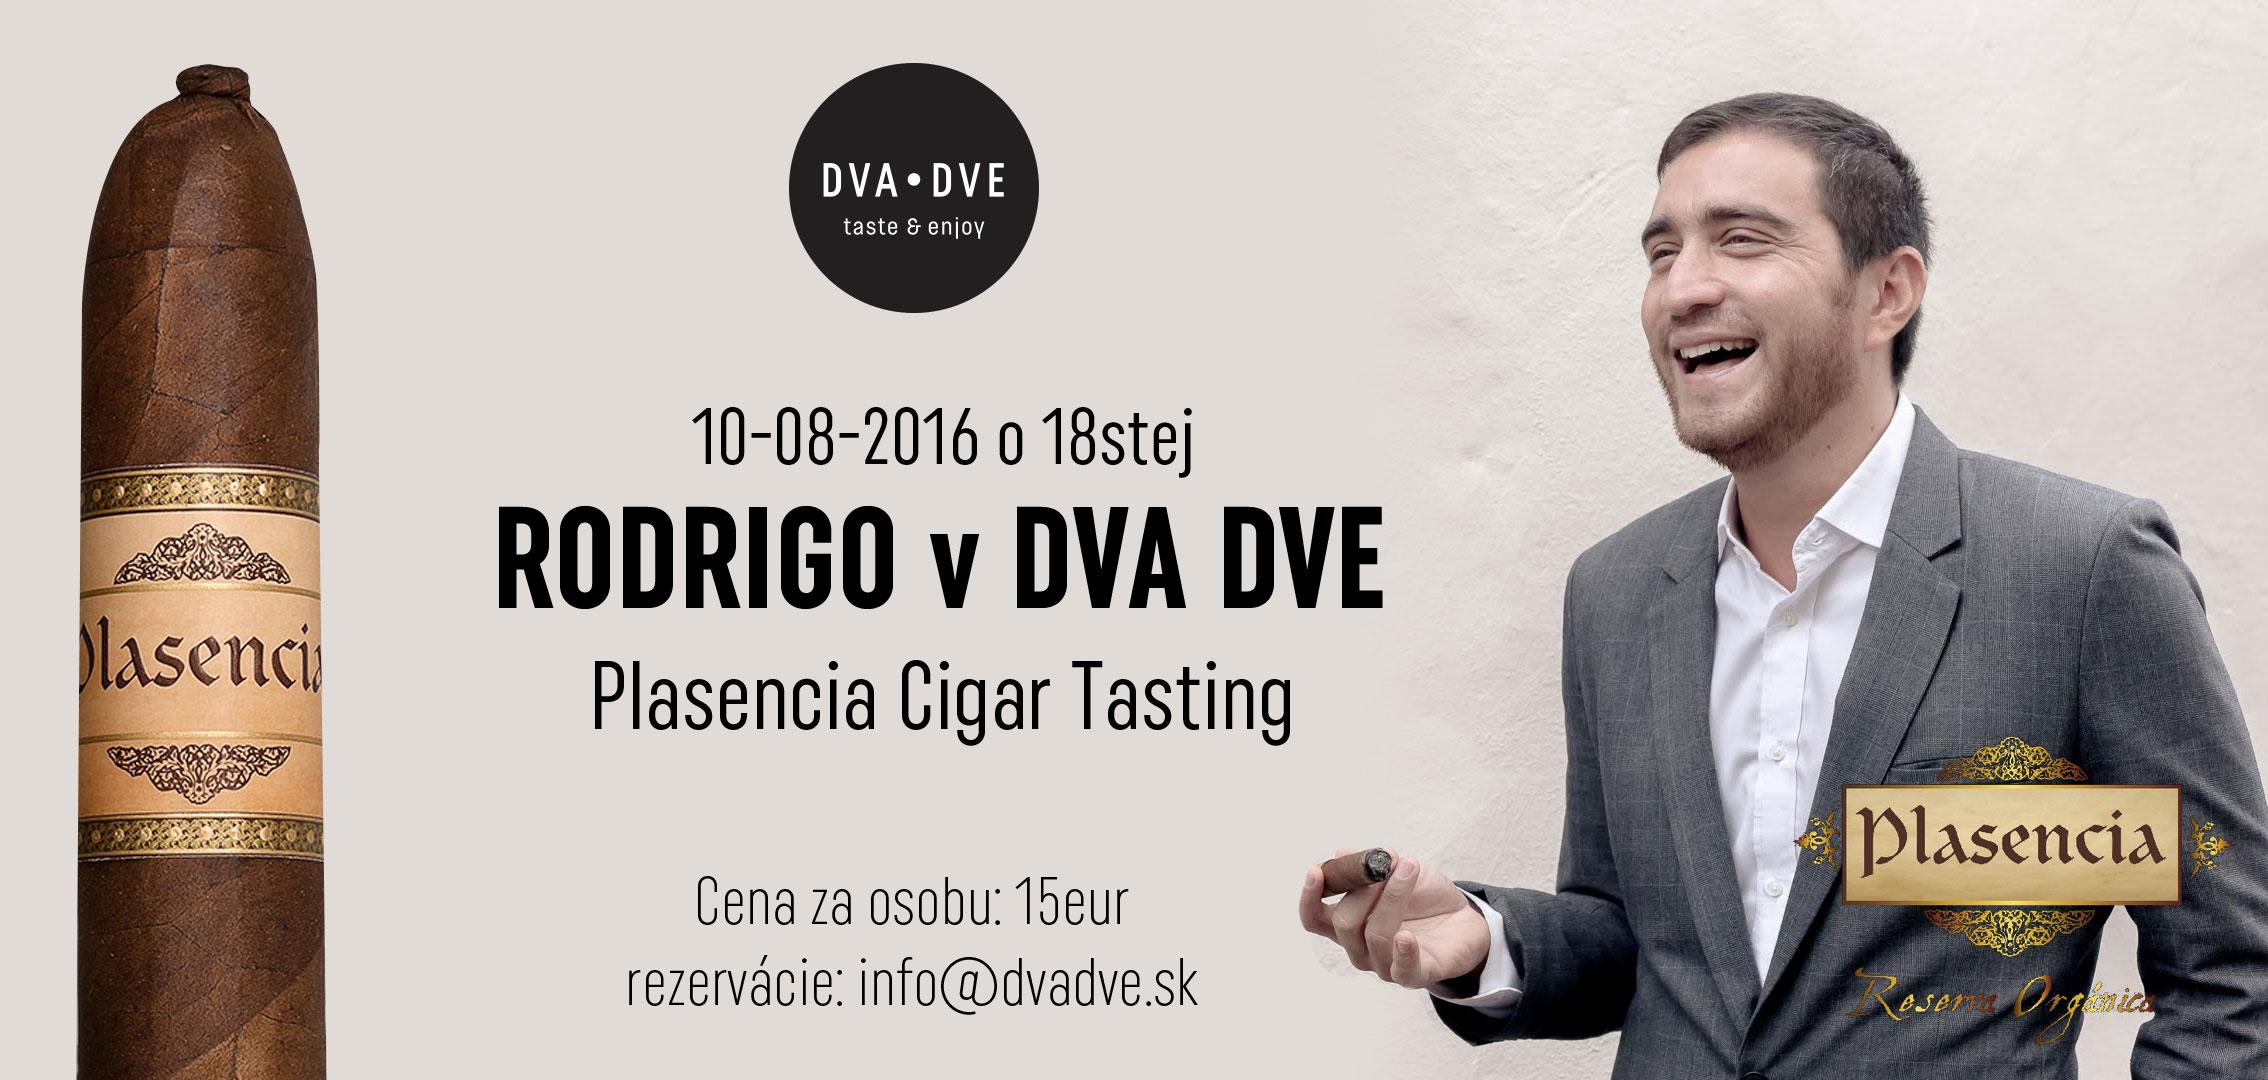 plasencia-cigar-tasting